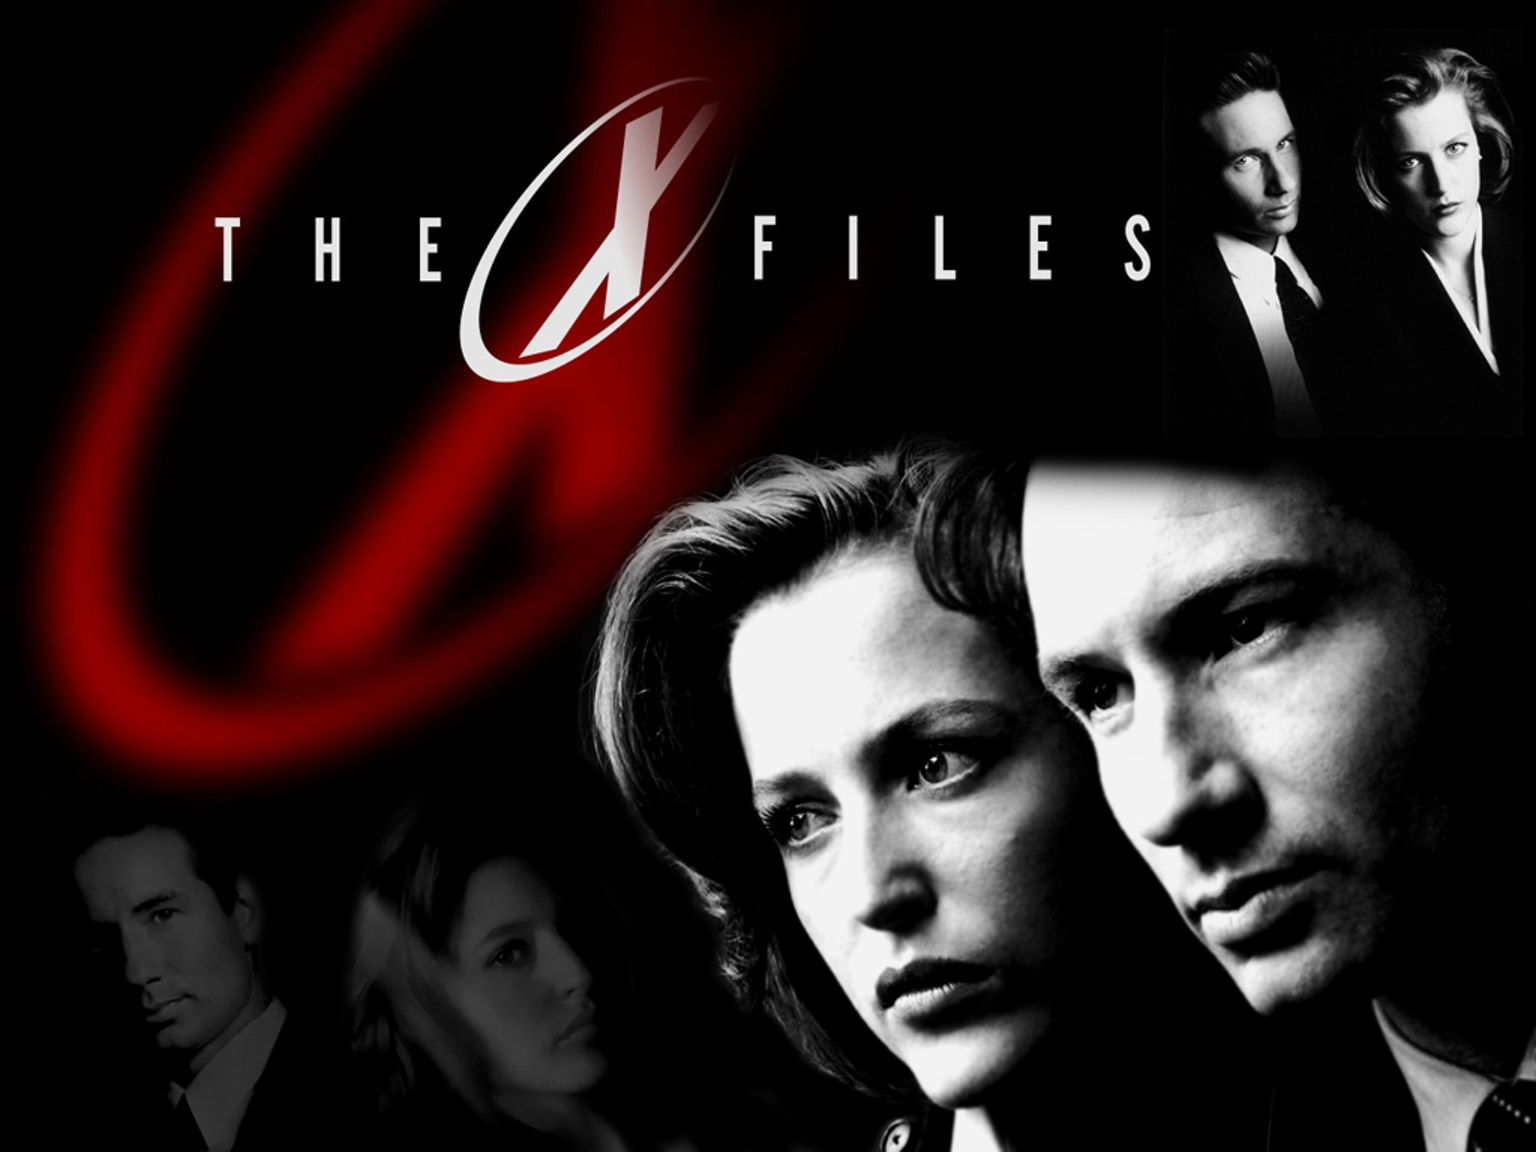 [影集] The X-Files (MiniSeries) (2016) Photo-original